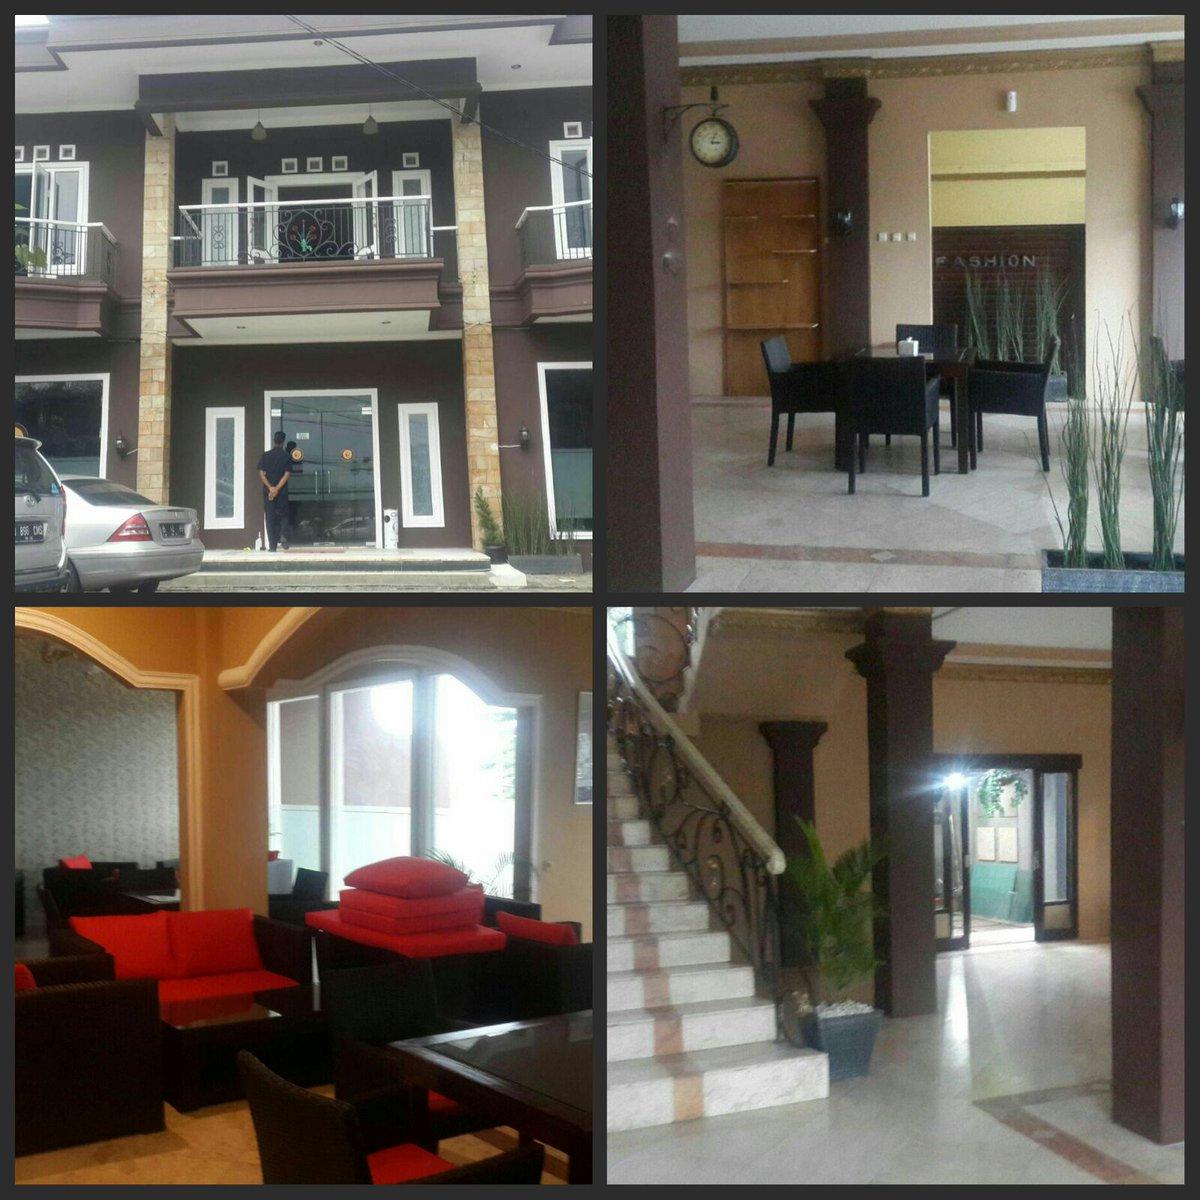 OmeR Cafe On Twitter Jln Pandu Raya 54 56 Now Open Lasagna Bogor 15K Kambing Bakar 55K Visitbogor Infokulinerbogor Tco DjV6M8uASs